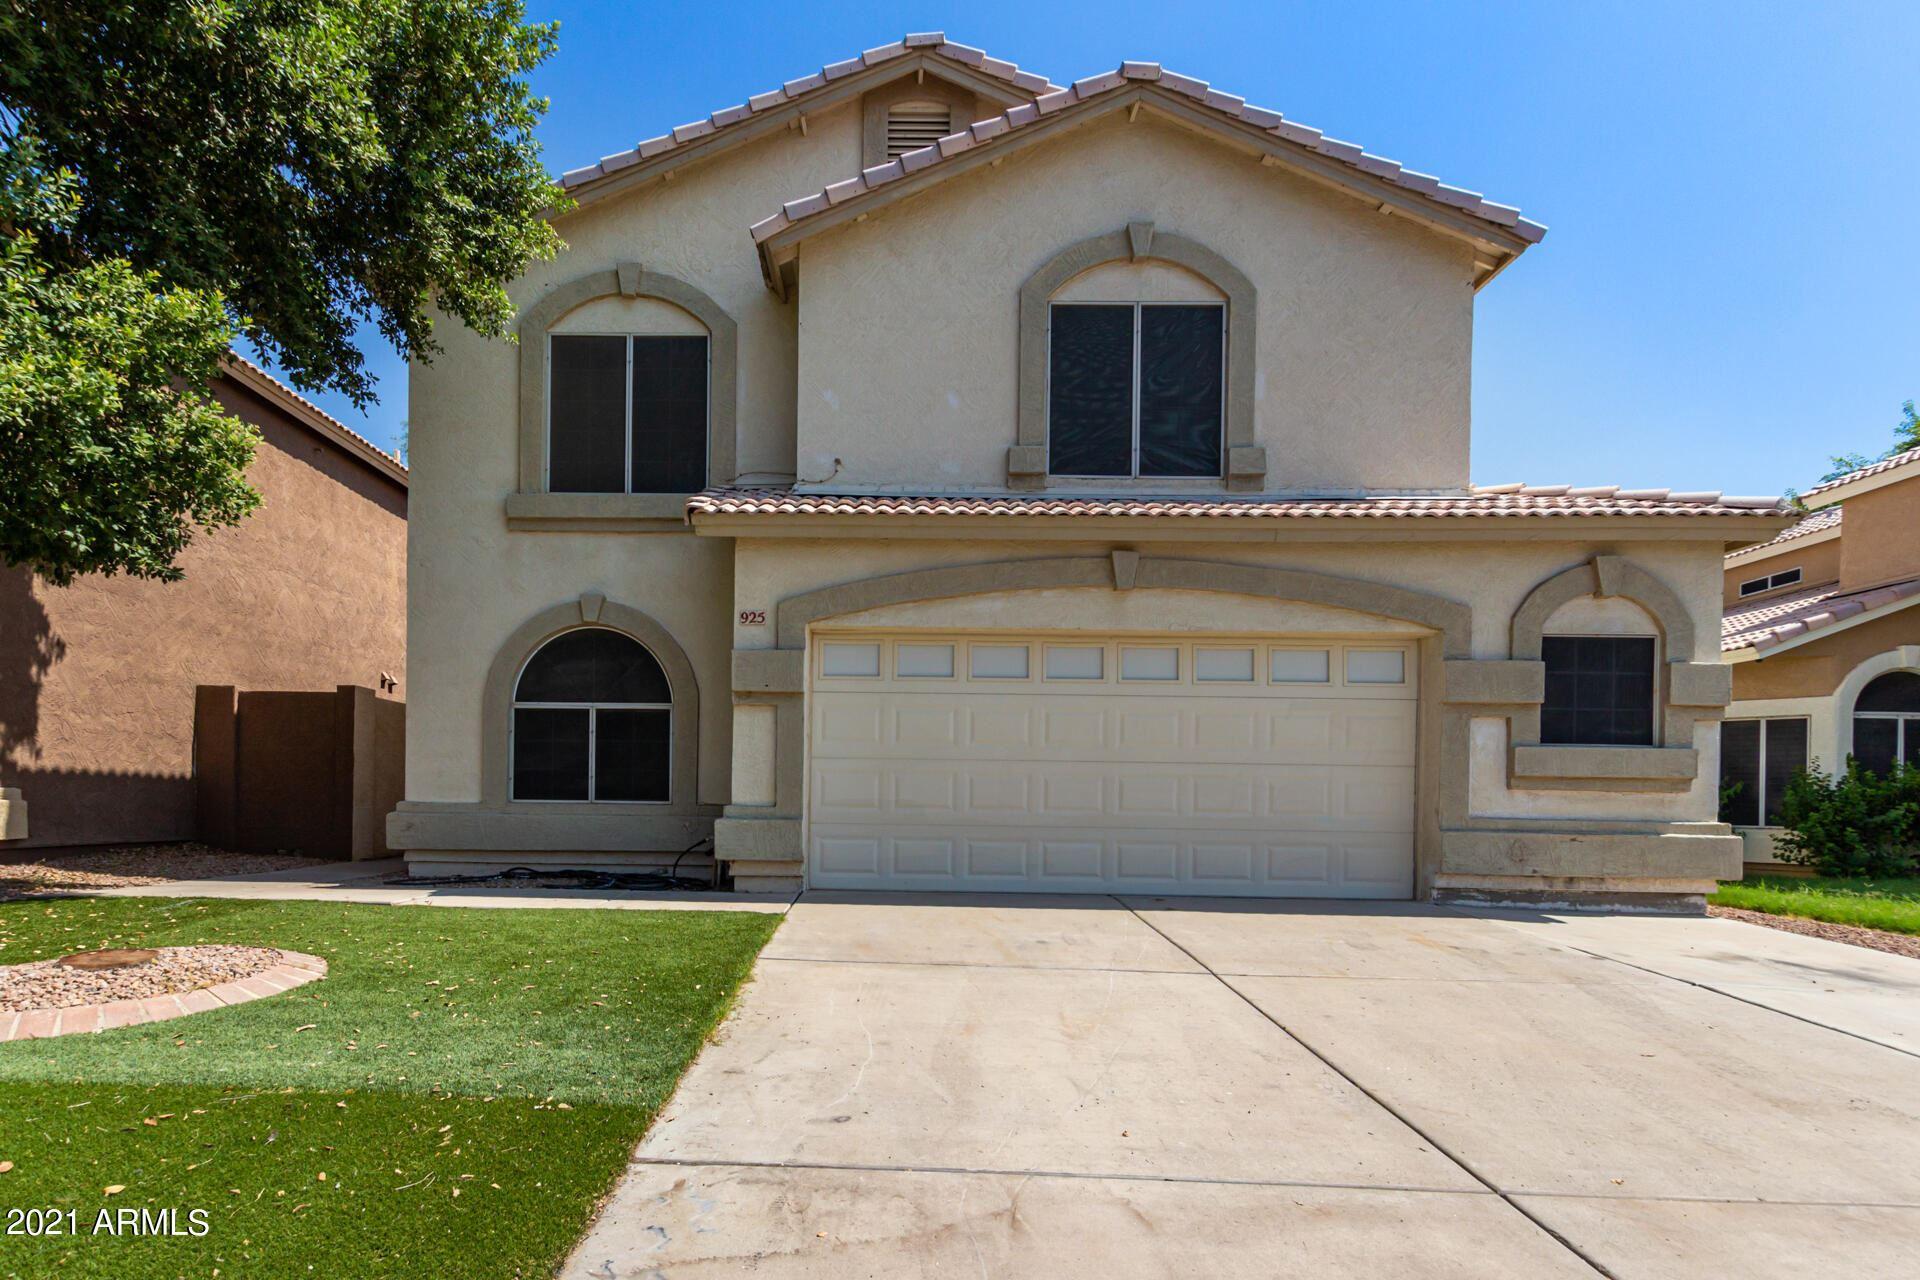 Photo of 925 N BLACKBIRD Drive, Gilbert, AZ 85234 (MLS # 6295235)